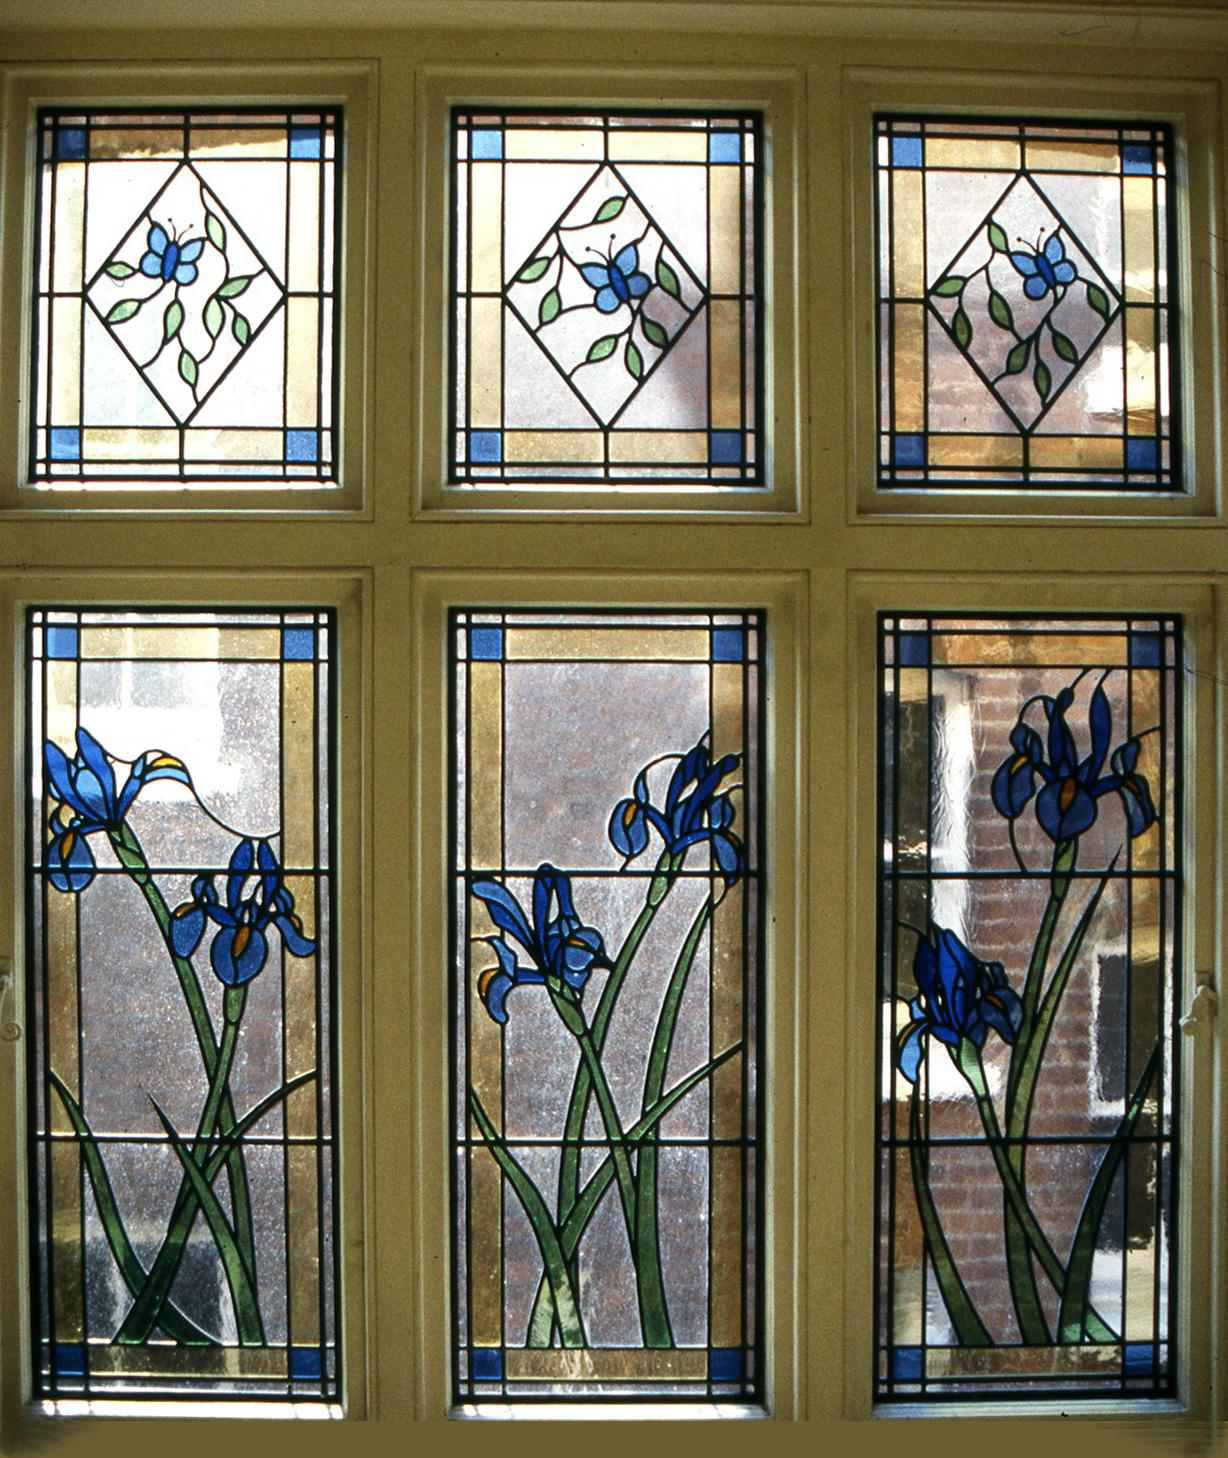 Irises window on stairs. Putney, London.